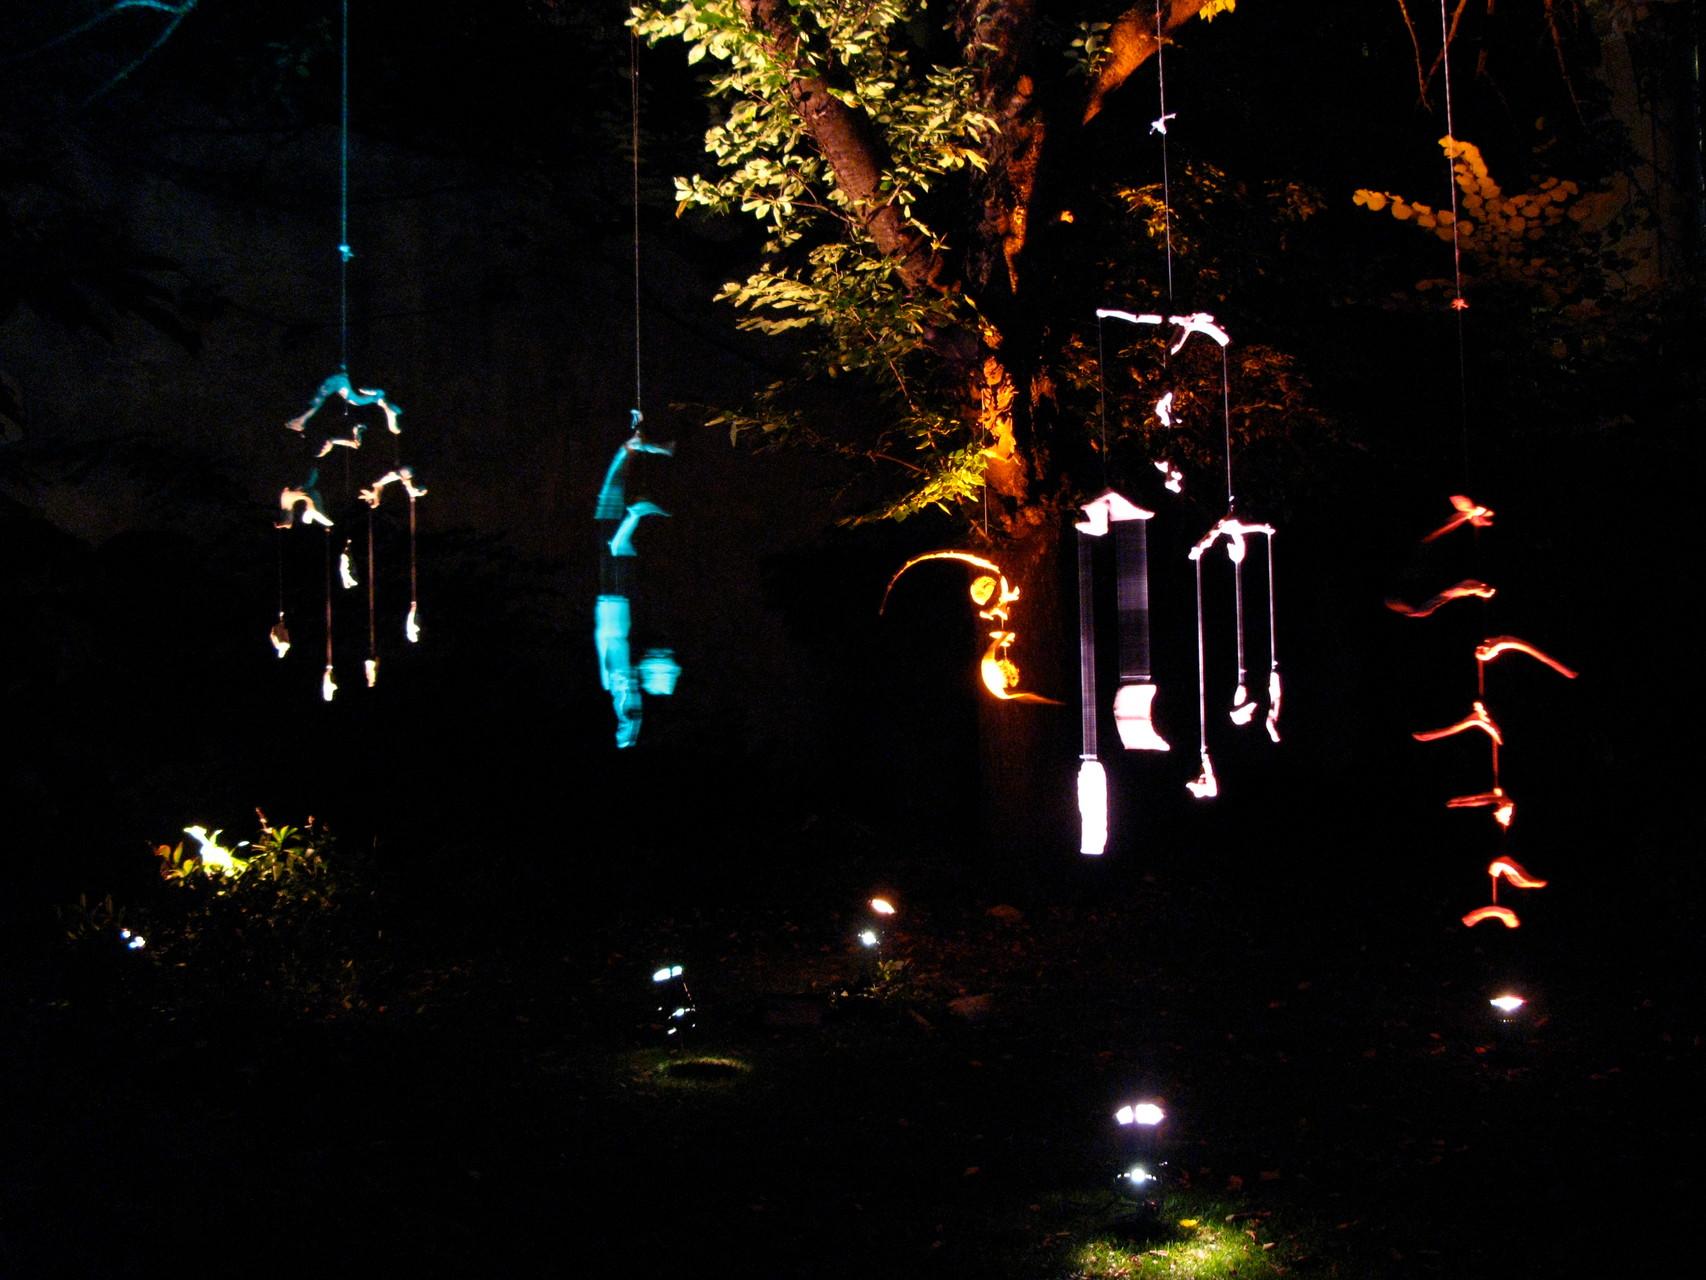 Mobiles, Lange Nacht der Museen 2006, Wolfgang Wallner, Hall in Tirol